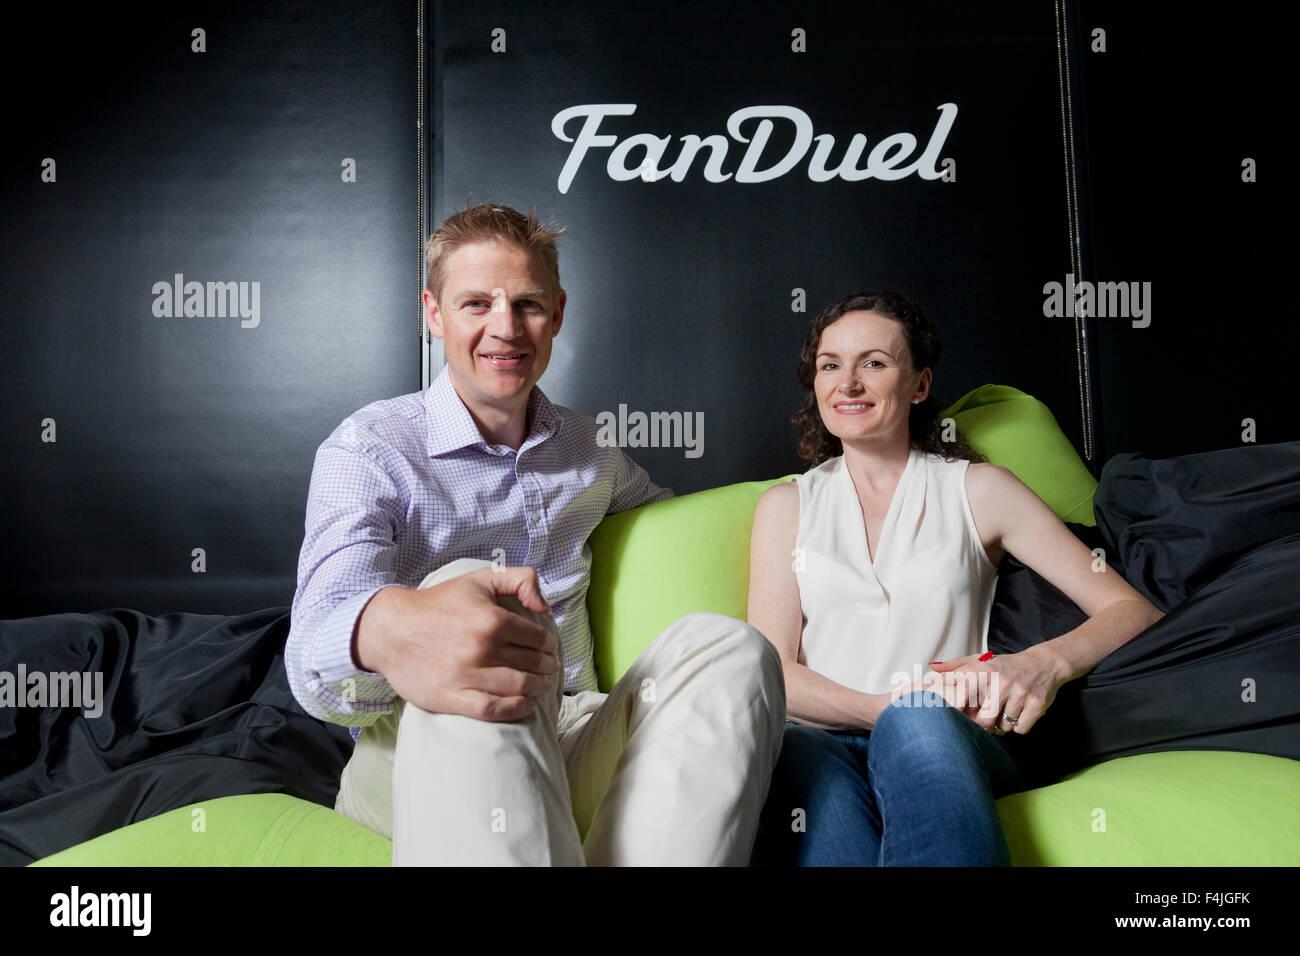 Nigel (left) and Lesley Eccles. Co-founders of online fantasy sports platform, FanDuel. Edinburgh, Scotland. - Stock Image